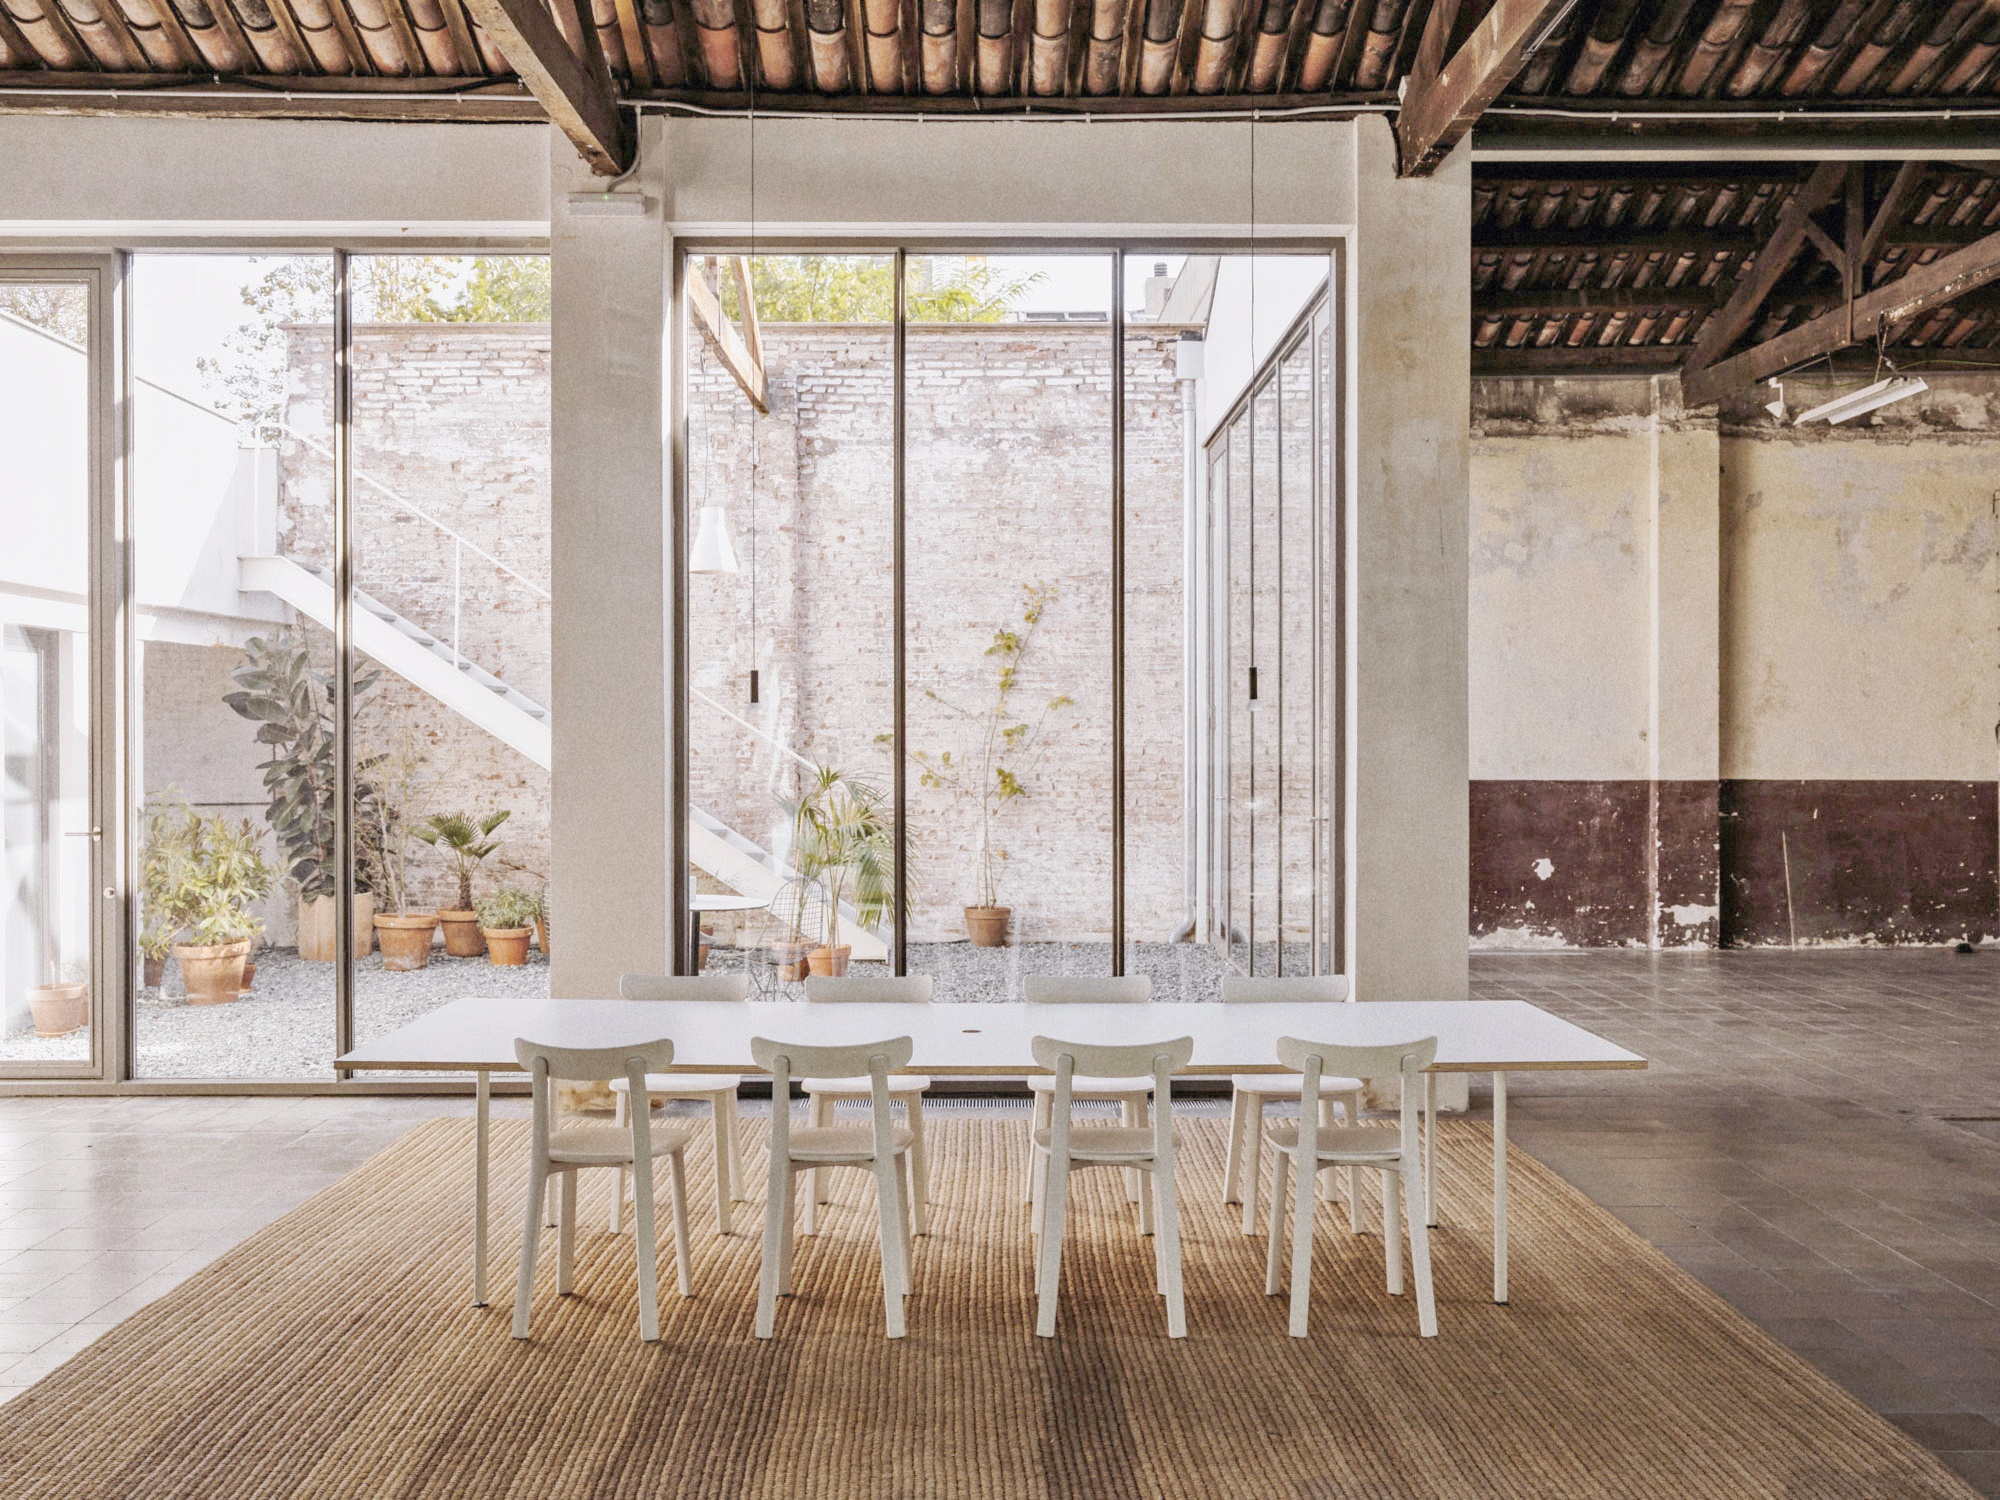 Showrooms en Barcelona: Importantes ideas para inspirar un proyecto showrooms Showrooms en Barcelona: Importantes ideas para inspirar un proyecto Vitra 1